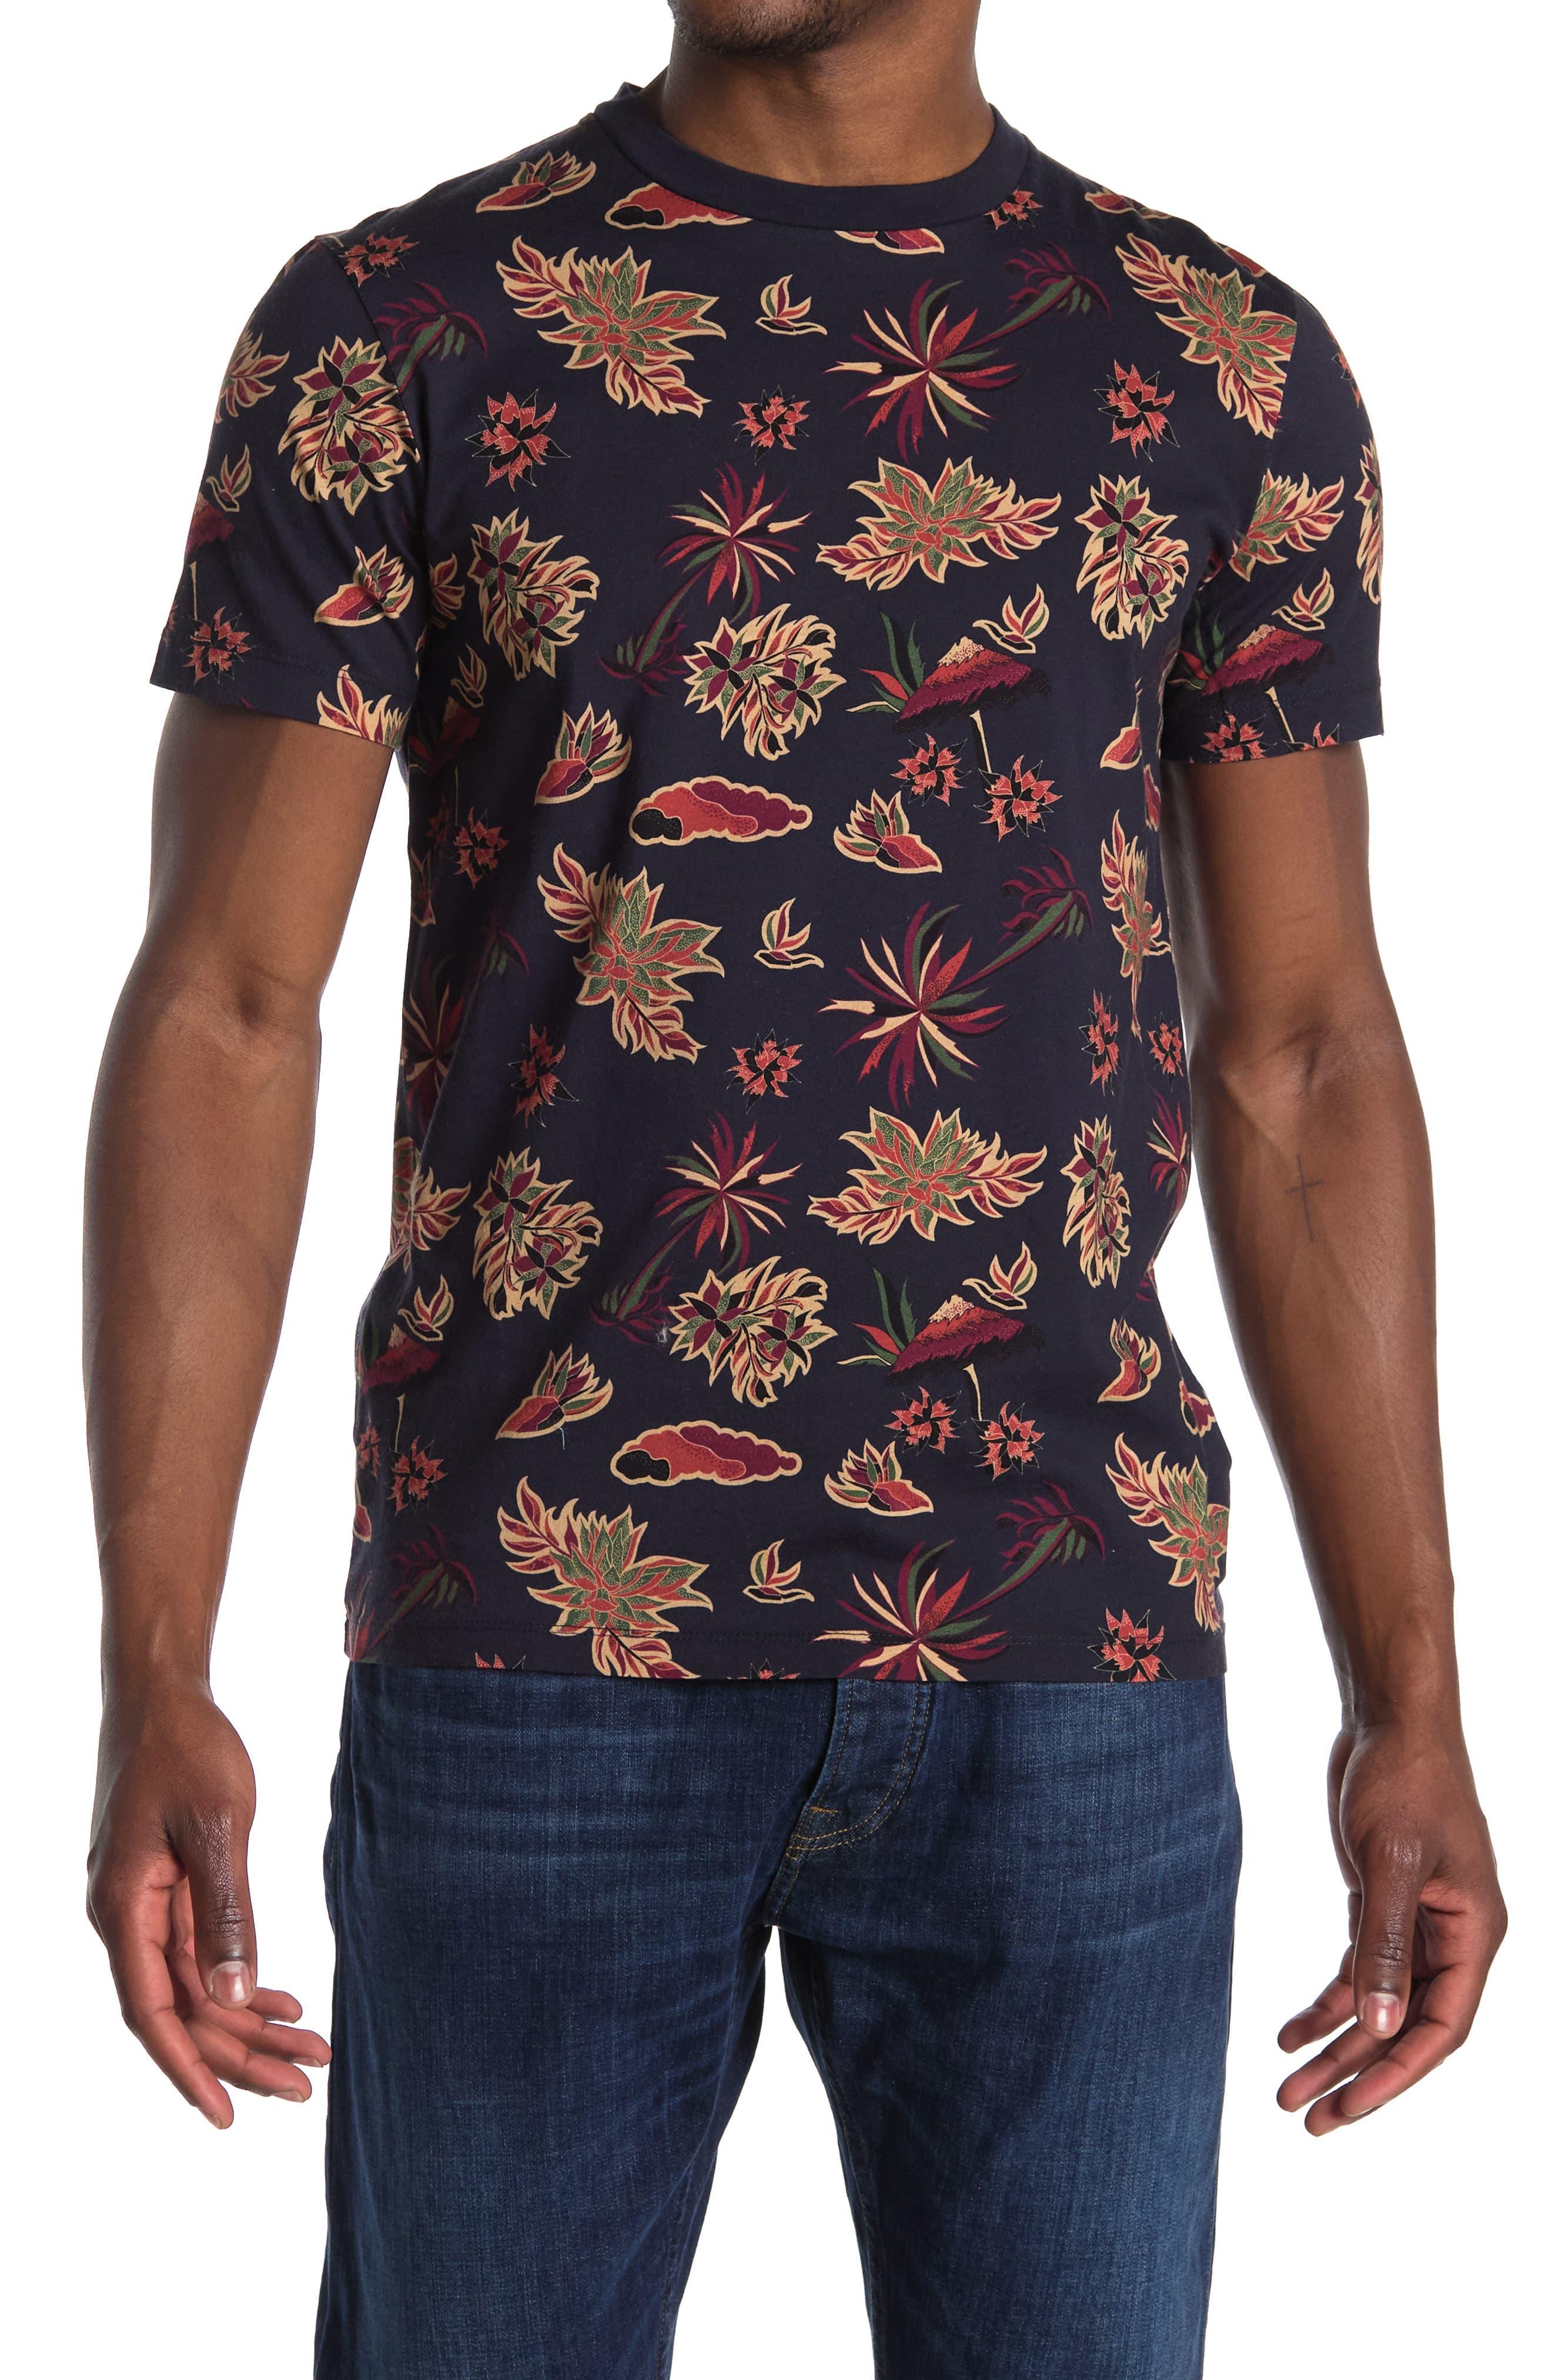 Image of Scotch & Soda Tropical Print Crew Neck T-Shirt